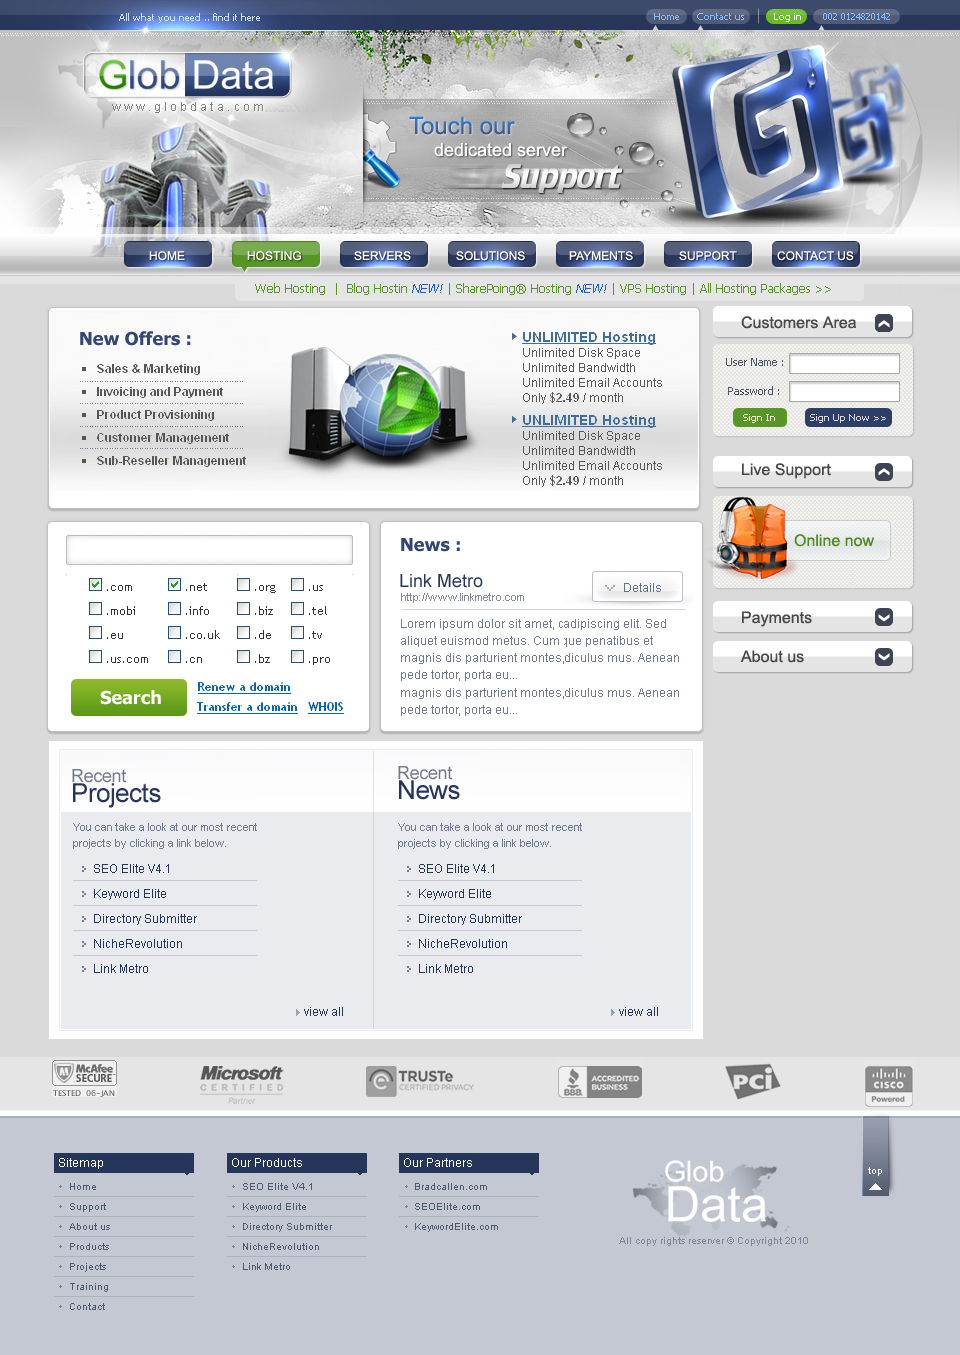 Glob-Data-website by desdoc